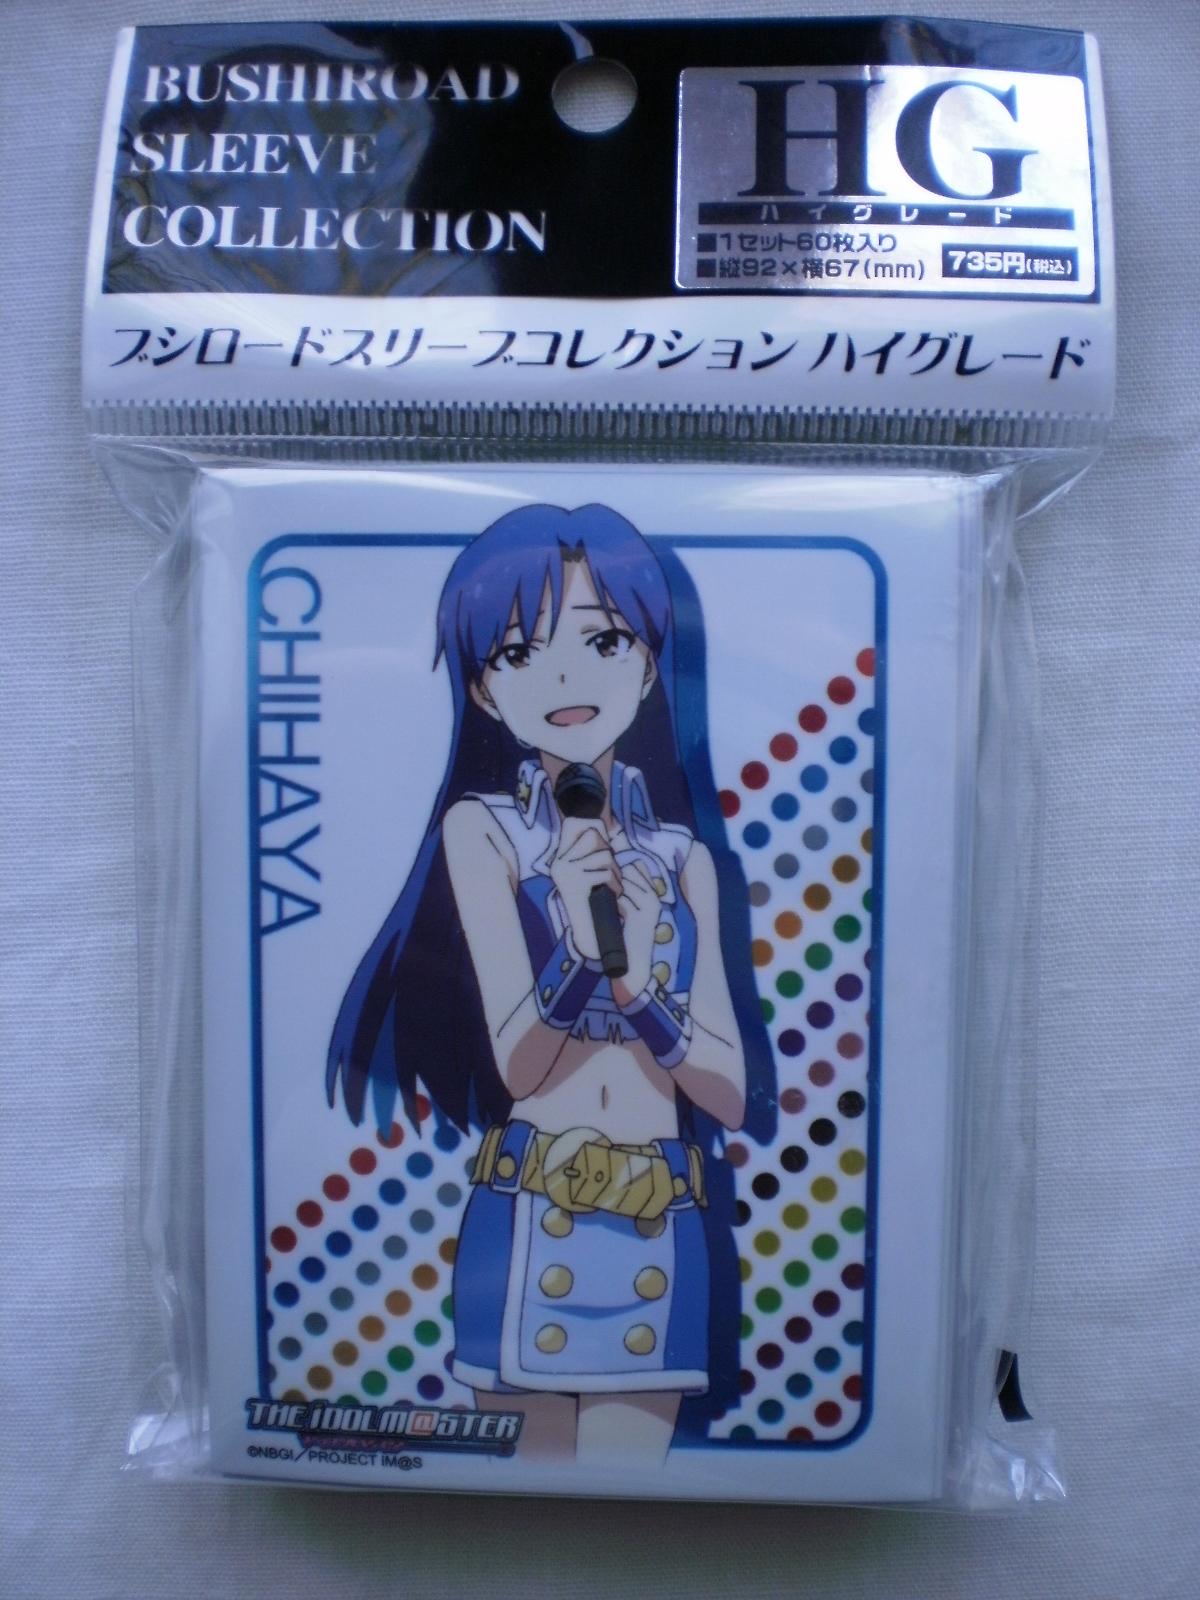 kisaragi_chihaya bushiroad card_sleeve bushiroad_sleeve_collection_hg the_idolmaster_(tv_animation)